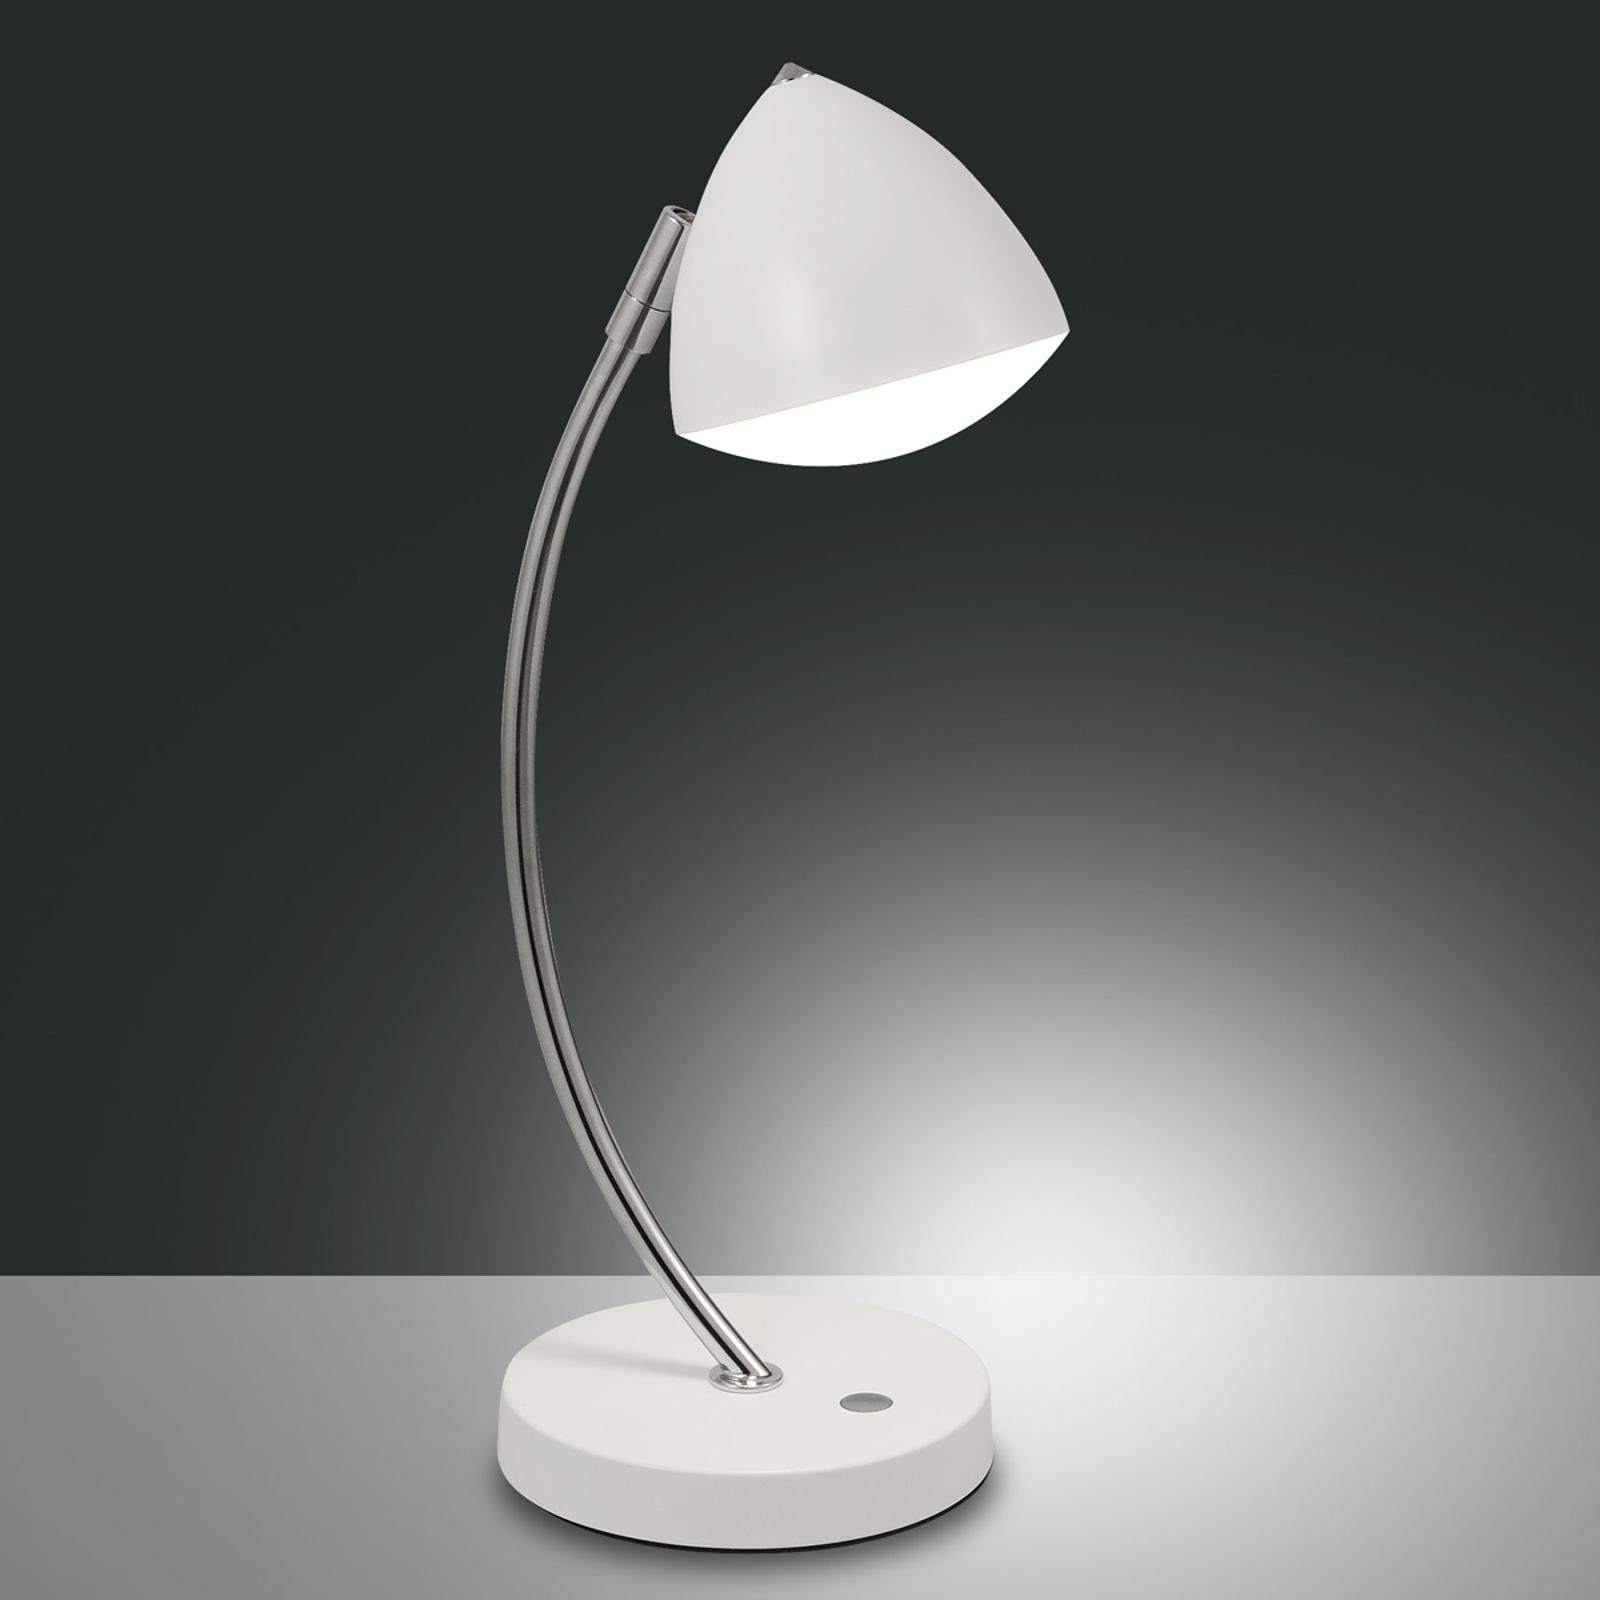 Bike - LED tafellamp met aanraakdimmer